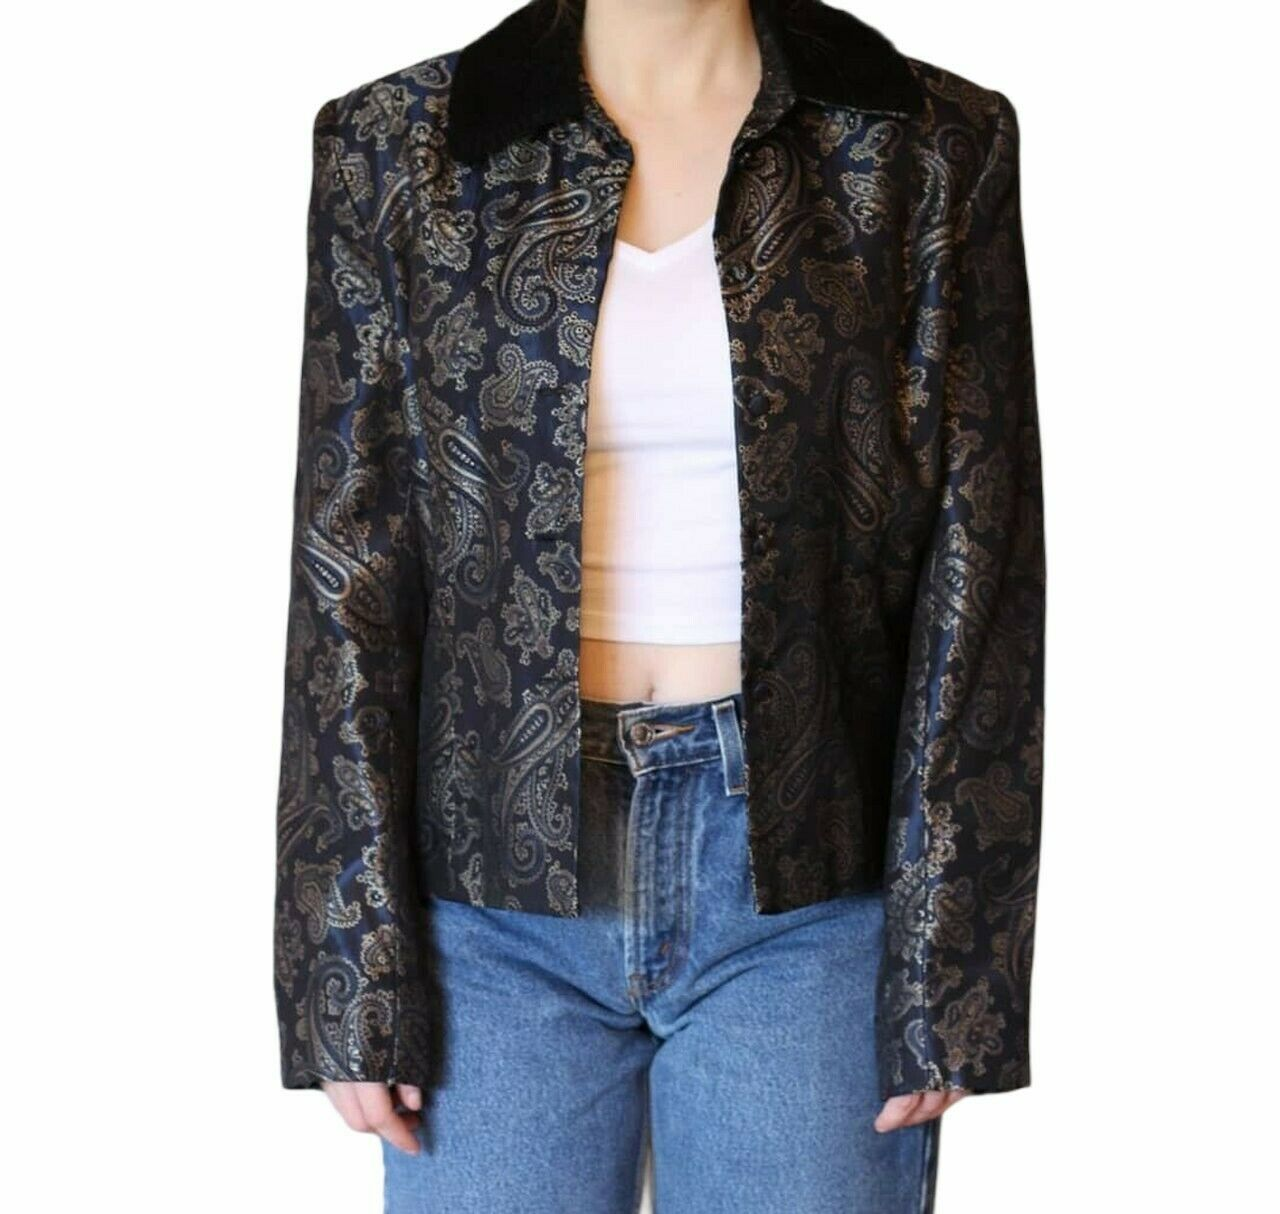 Vintage Y2K McClintock Gold Paisley Brocade NavyBlazer Jacket Faux Fur Collar